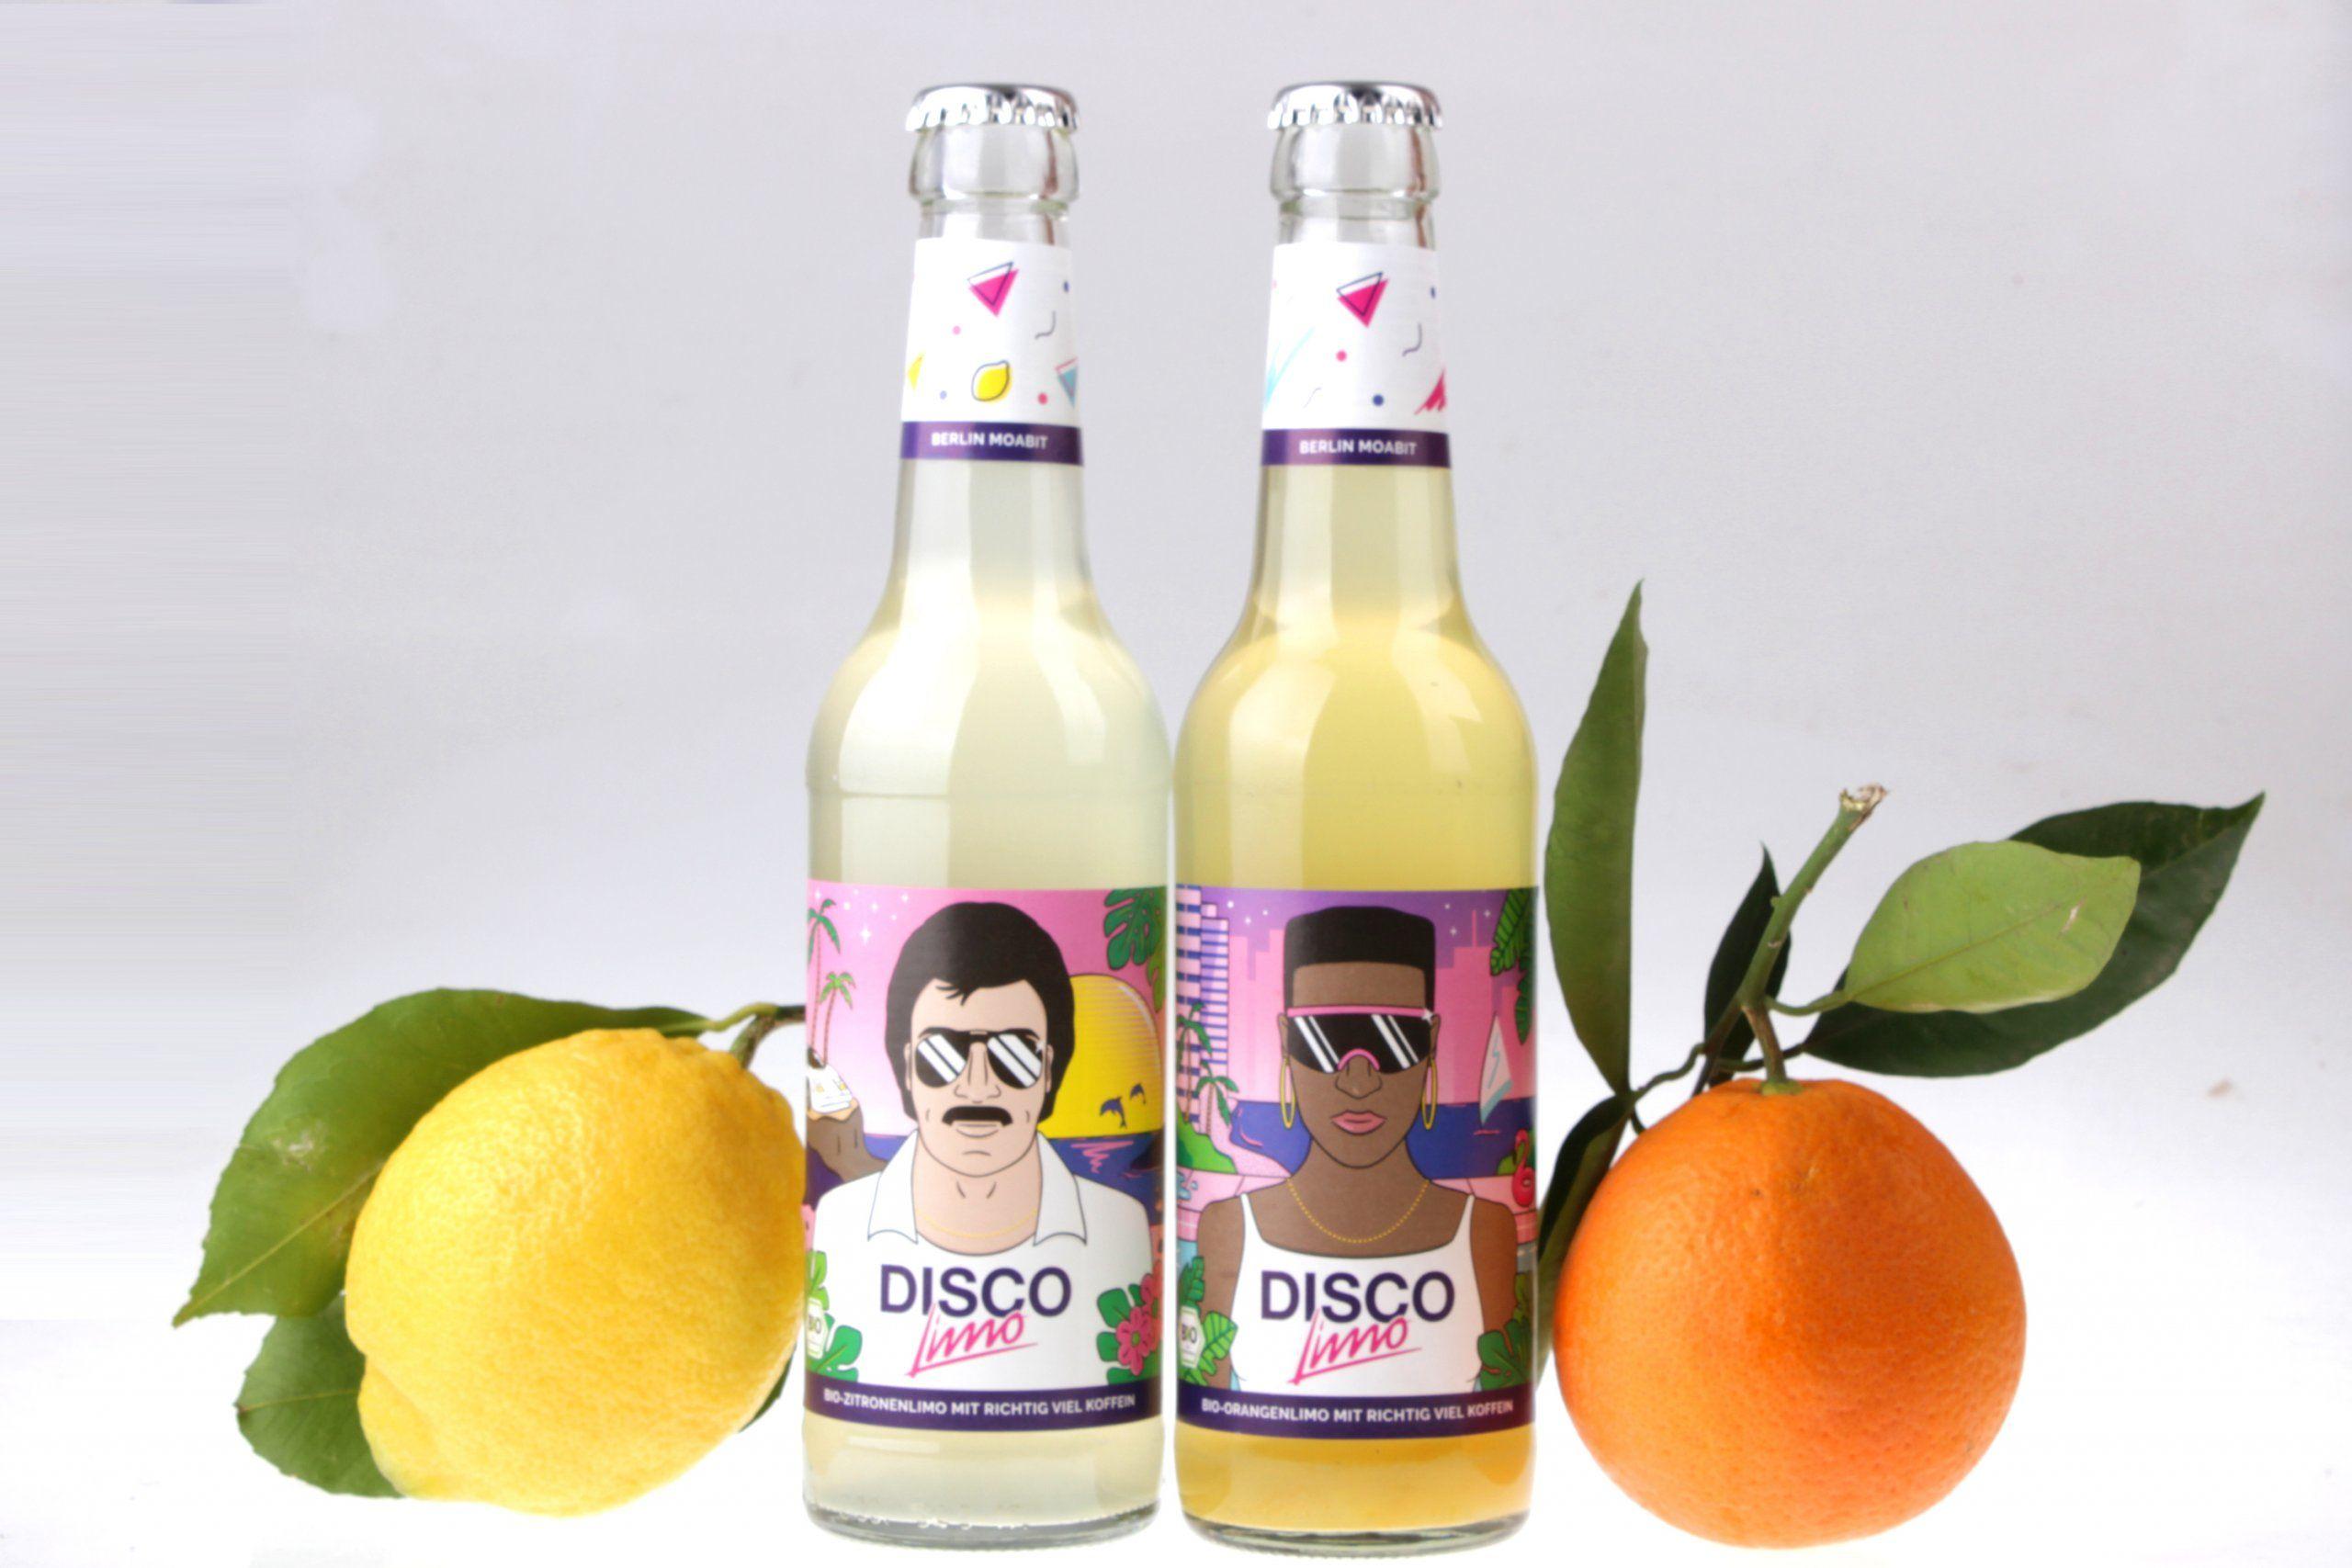 Disco Limo Fever Mix von feinjemacht